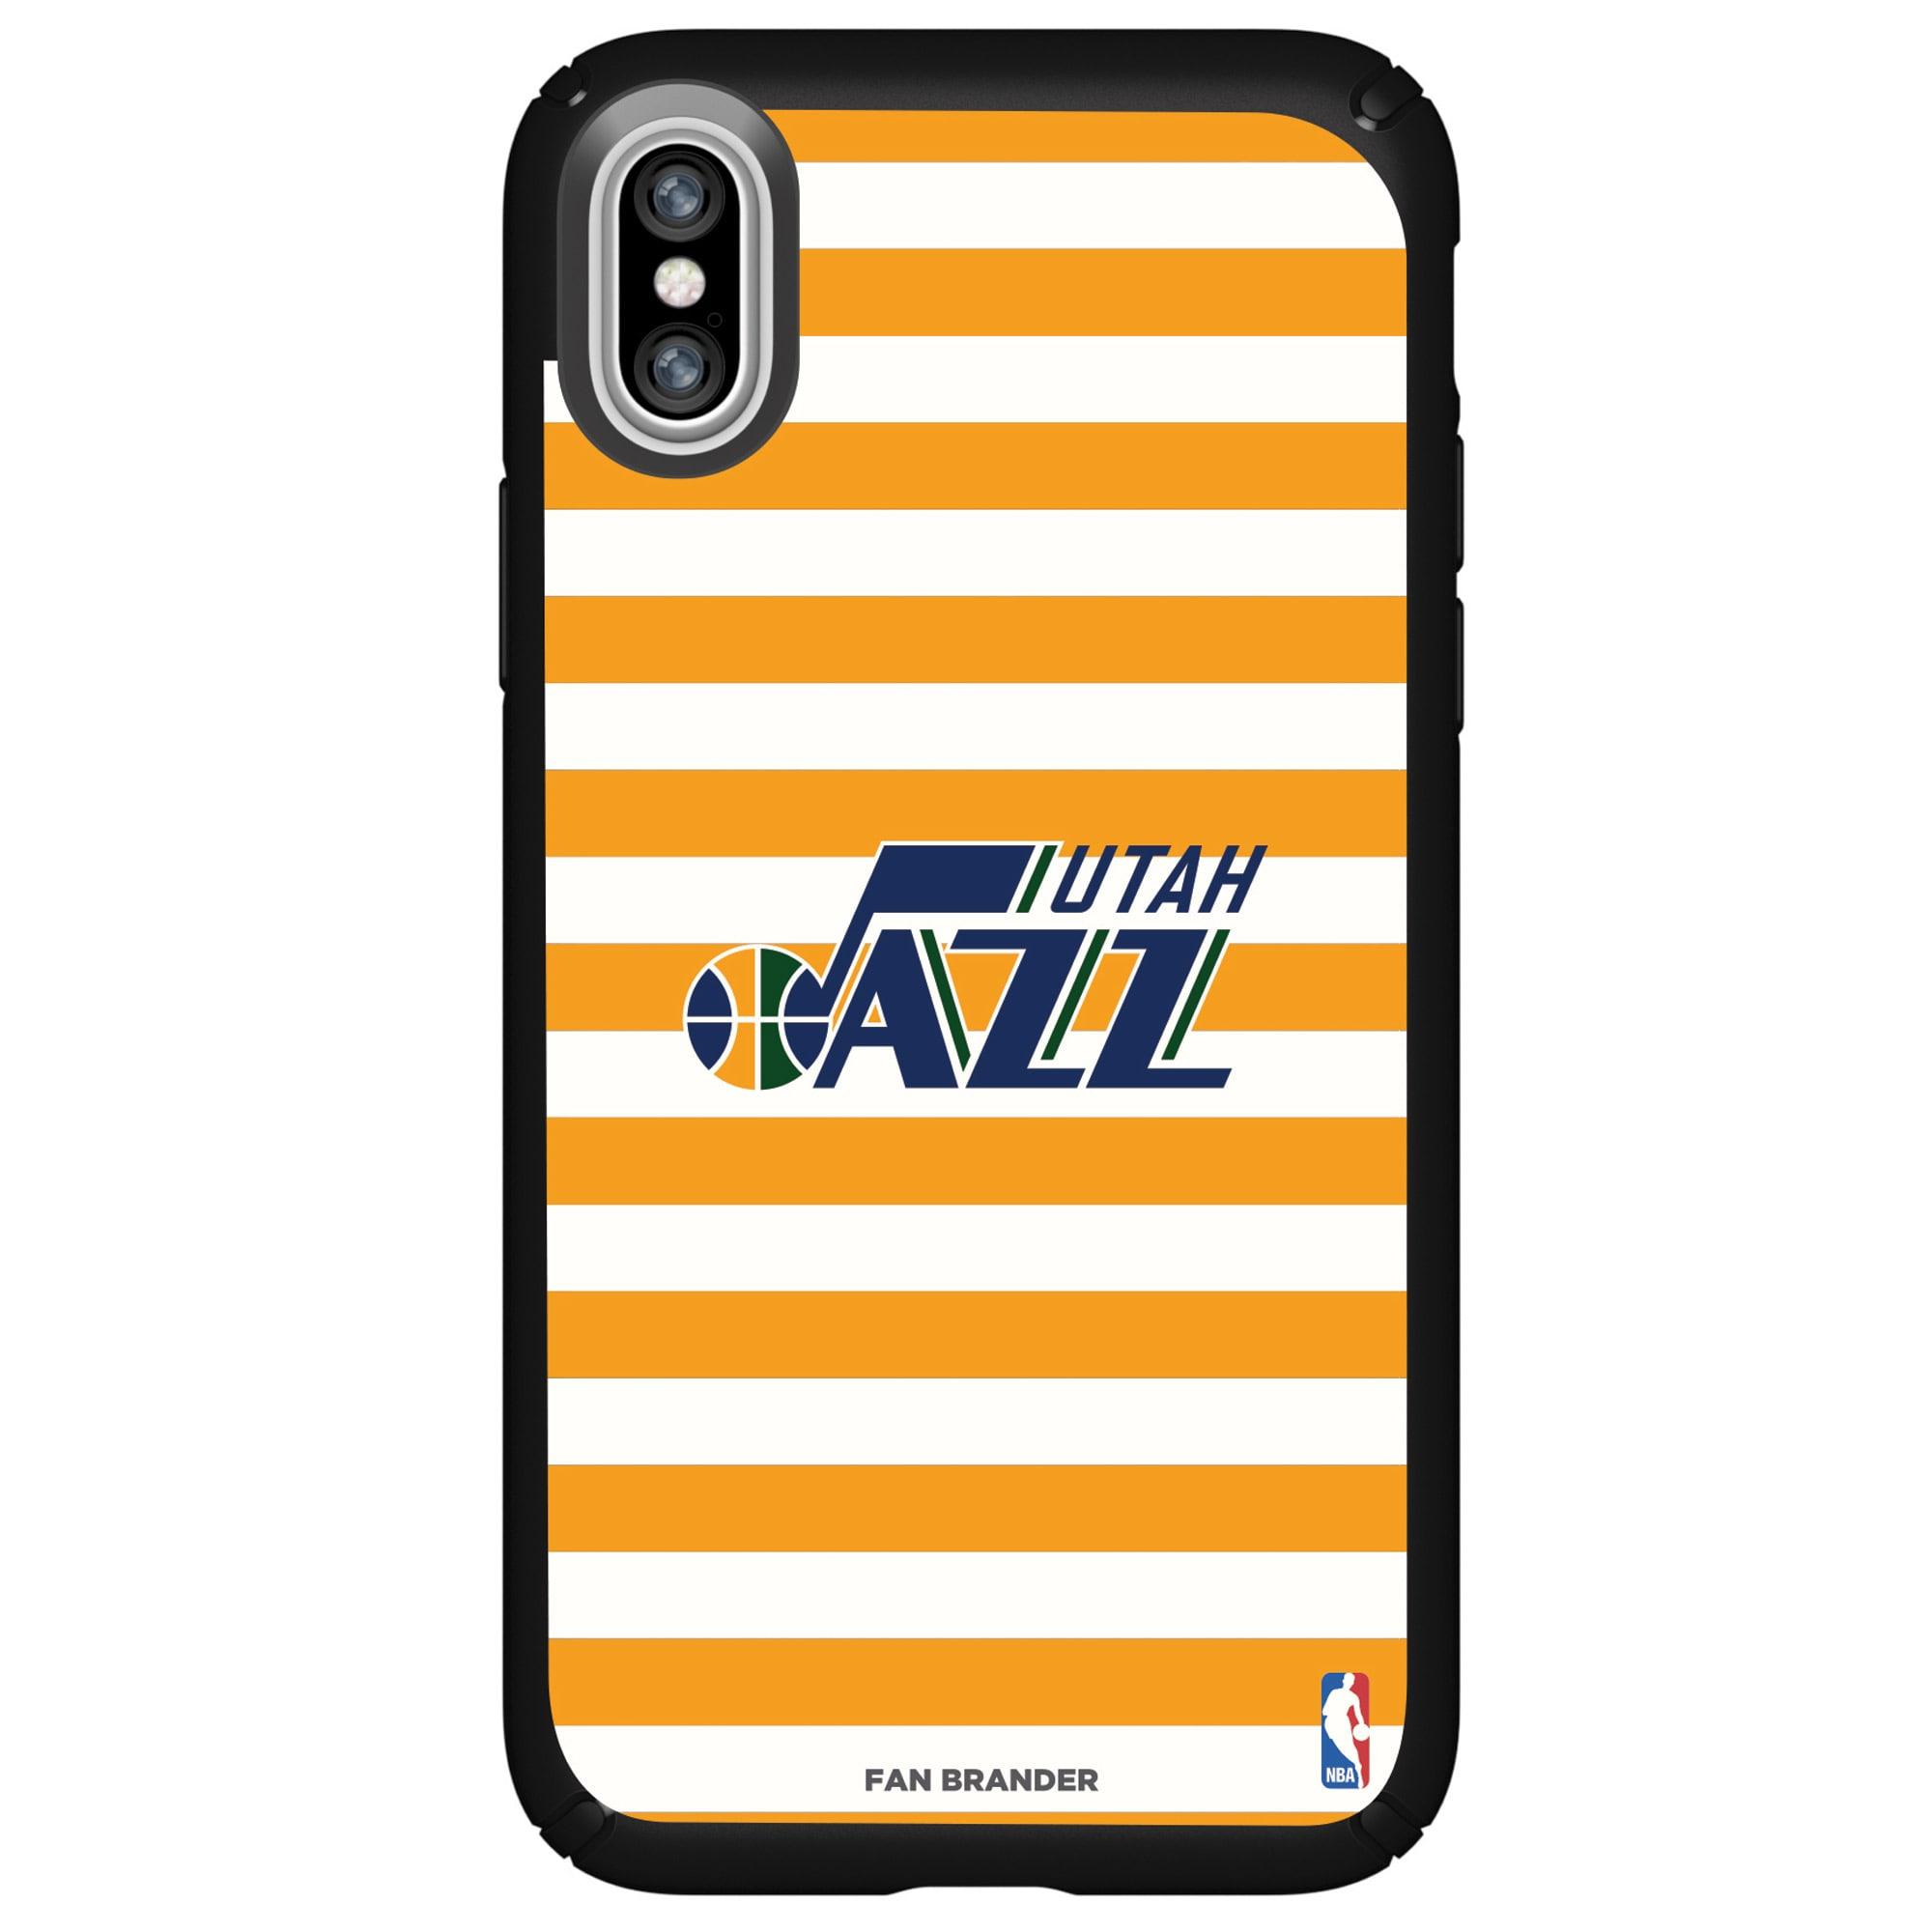 Utah Jazz Speck iPhone Presidio Striped Design Case